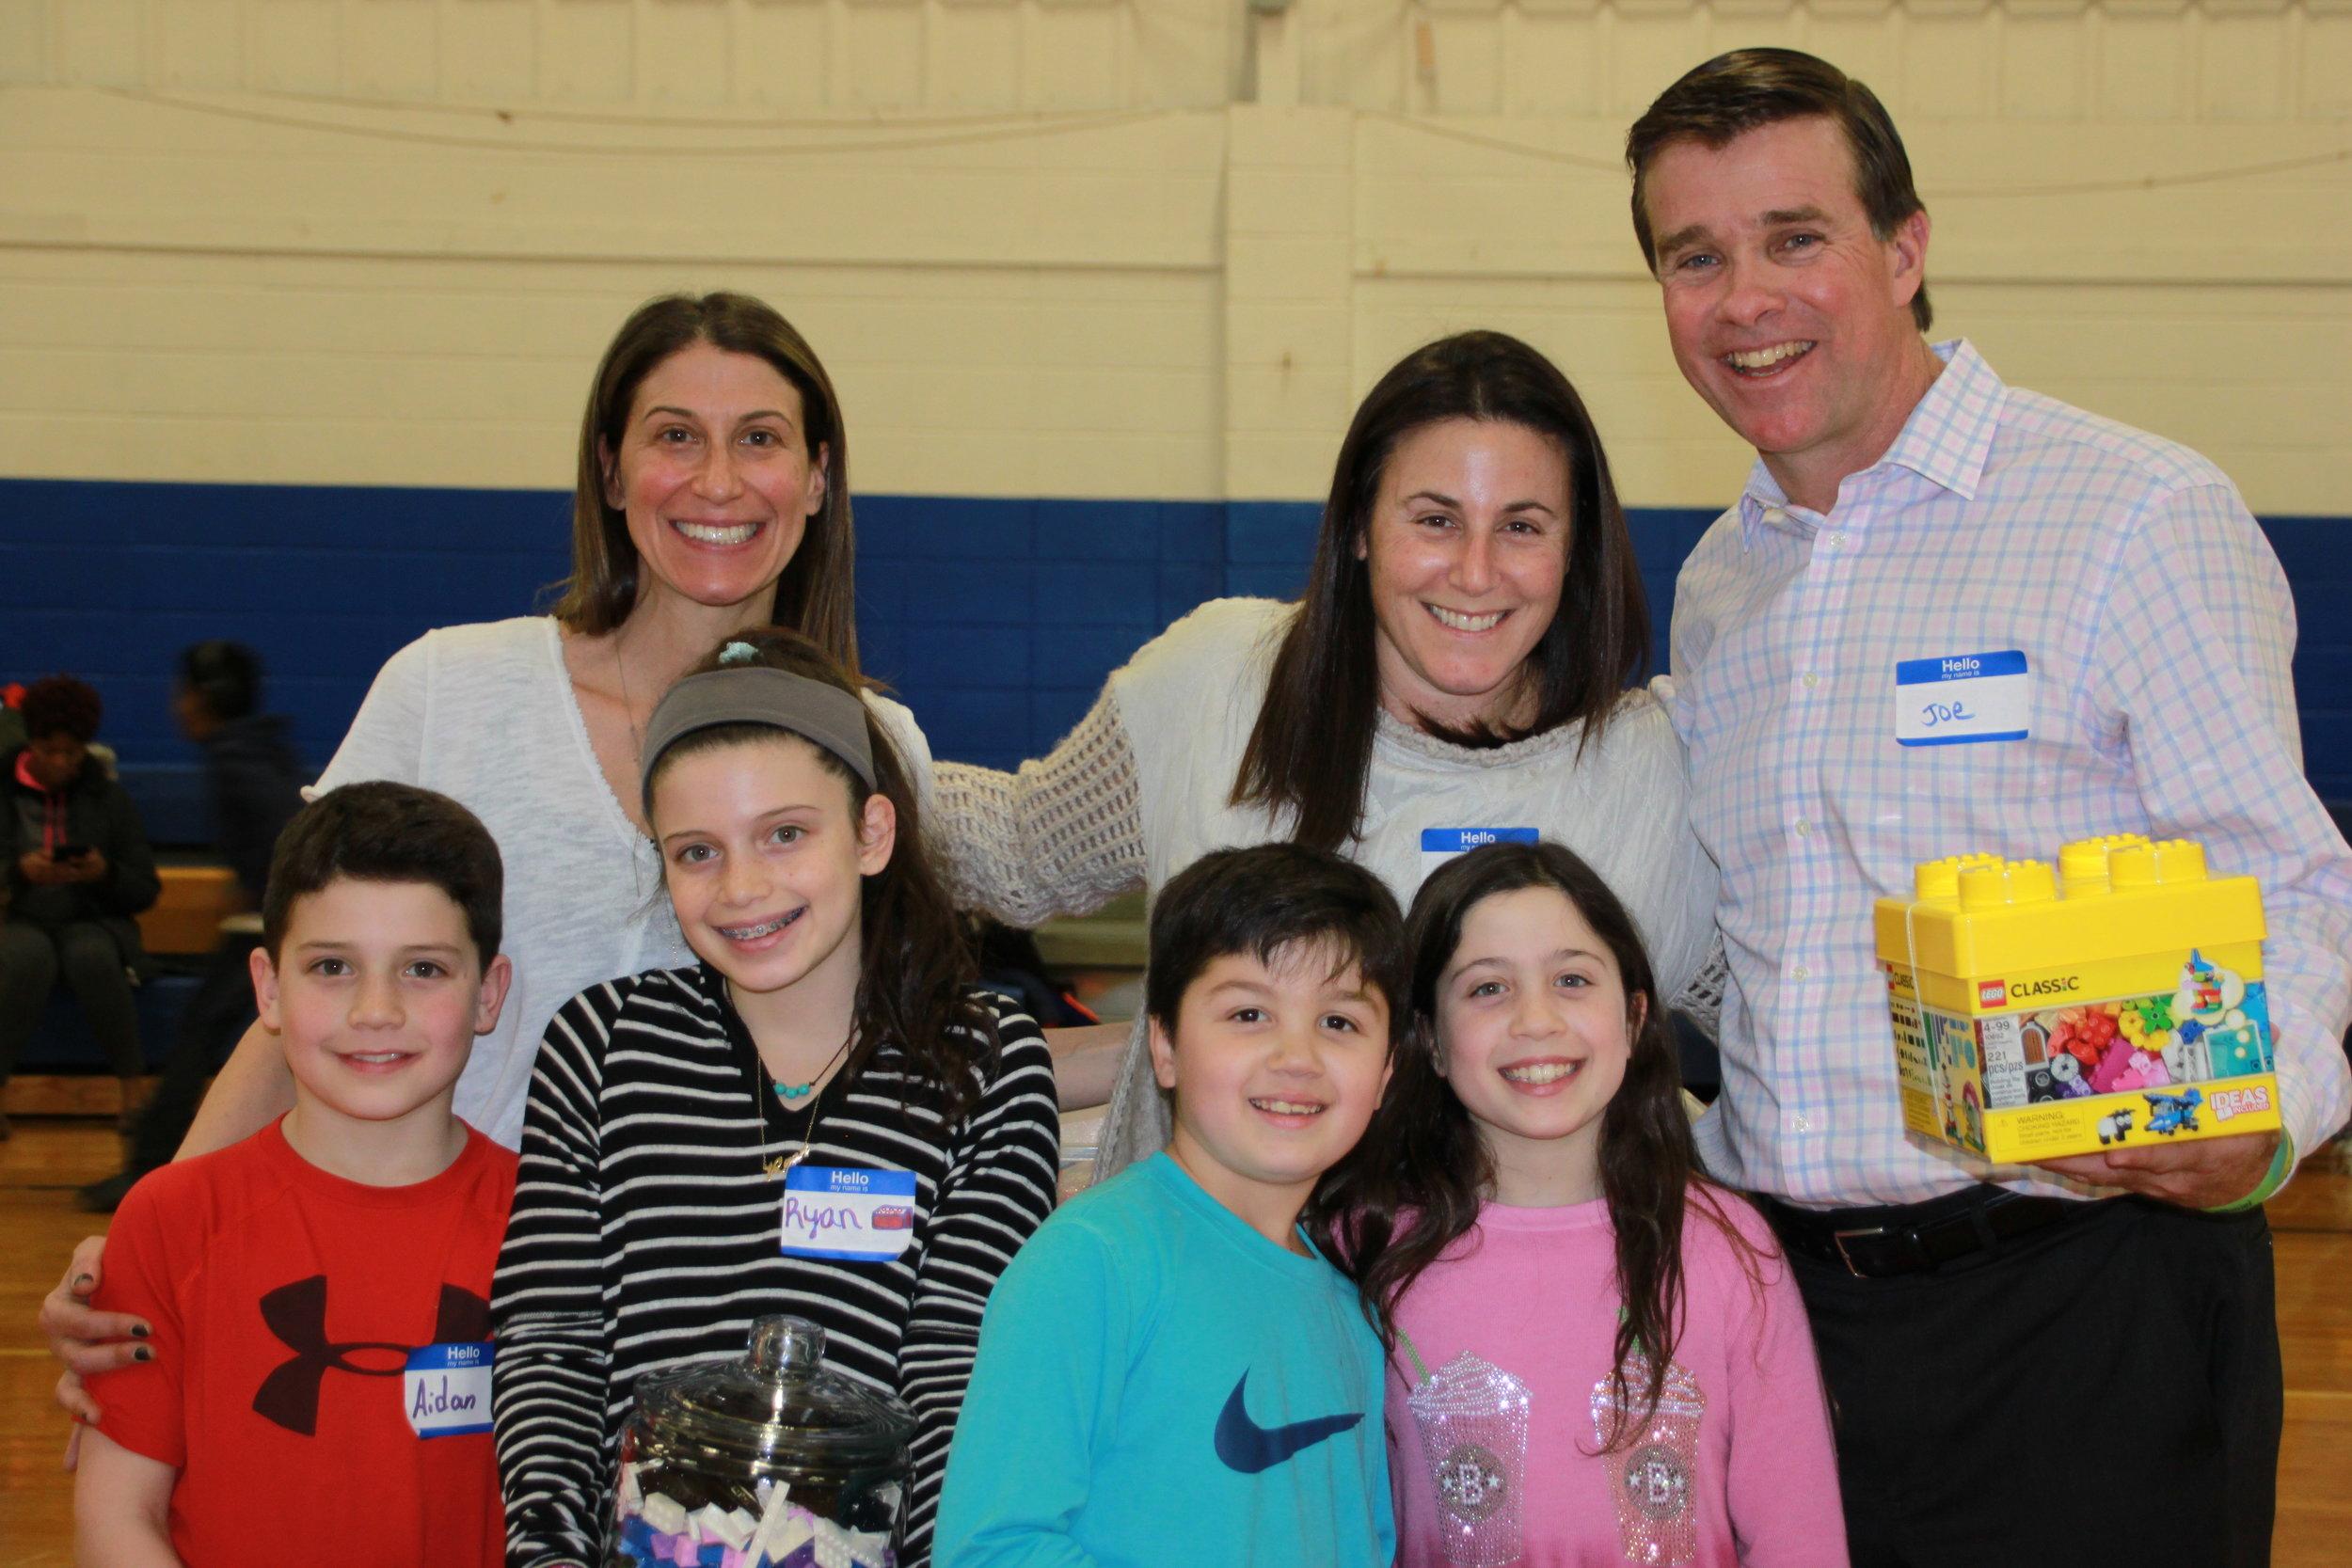 Dana Czuczka, Stacy Barenberg, their children, and Carver's Joe Gallagher